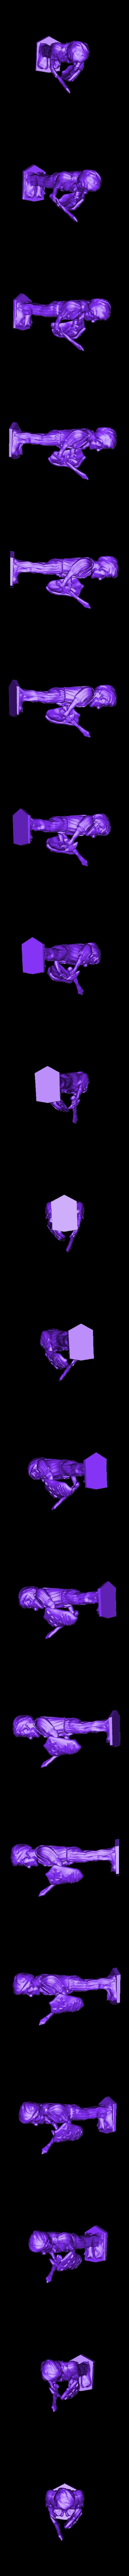 Stone_Nads_pl.obj Download free OBJ file Goliath Paladin • 3D printer model, Pza4Rza